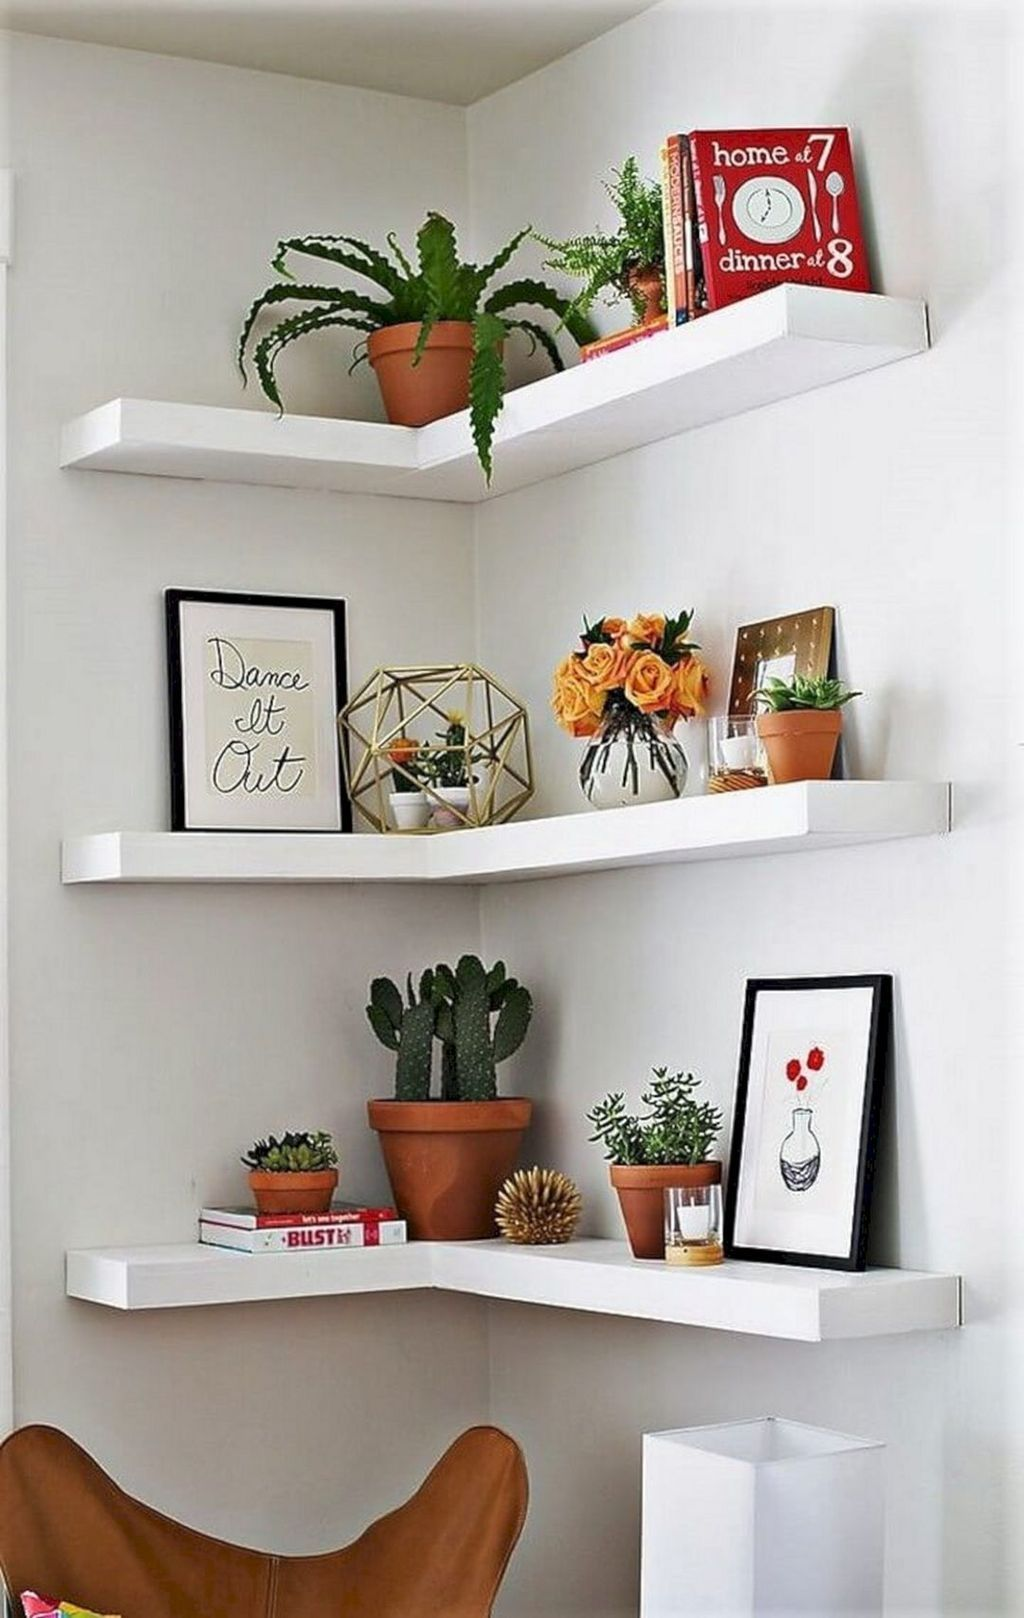 20 Creative Floating Corner Shelves For Living Room Organization Ideas In 2020 Corner Shelf Design Home Decor Shelf Design